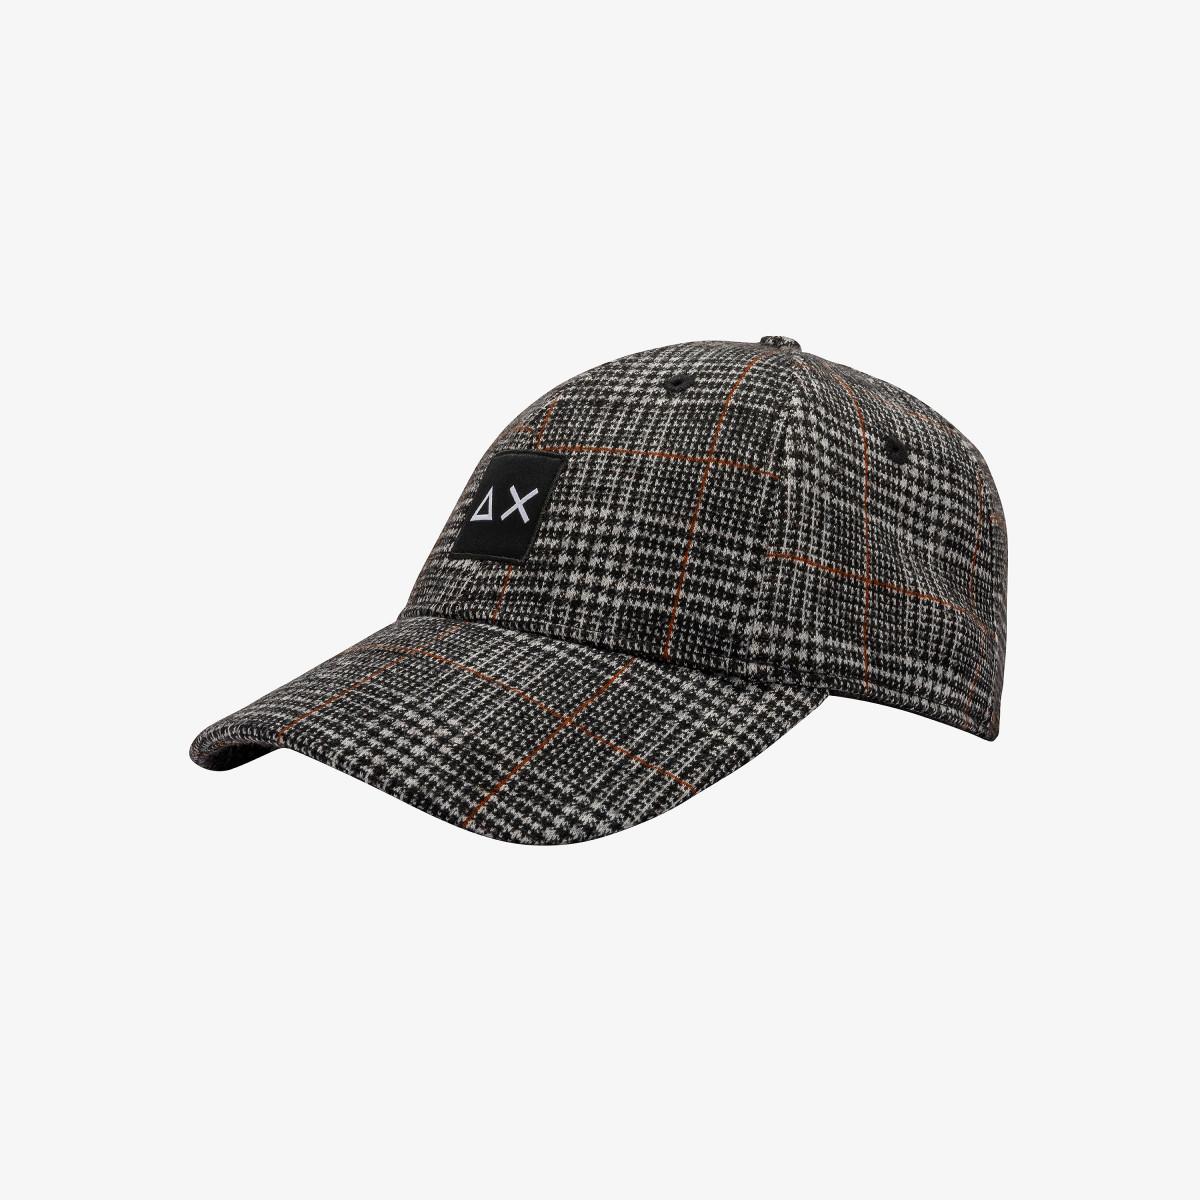 BASEBALL CAP PATTERN BLACK/BROWN